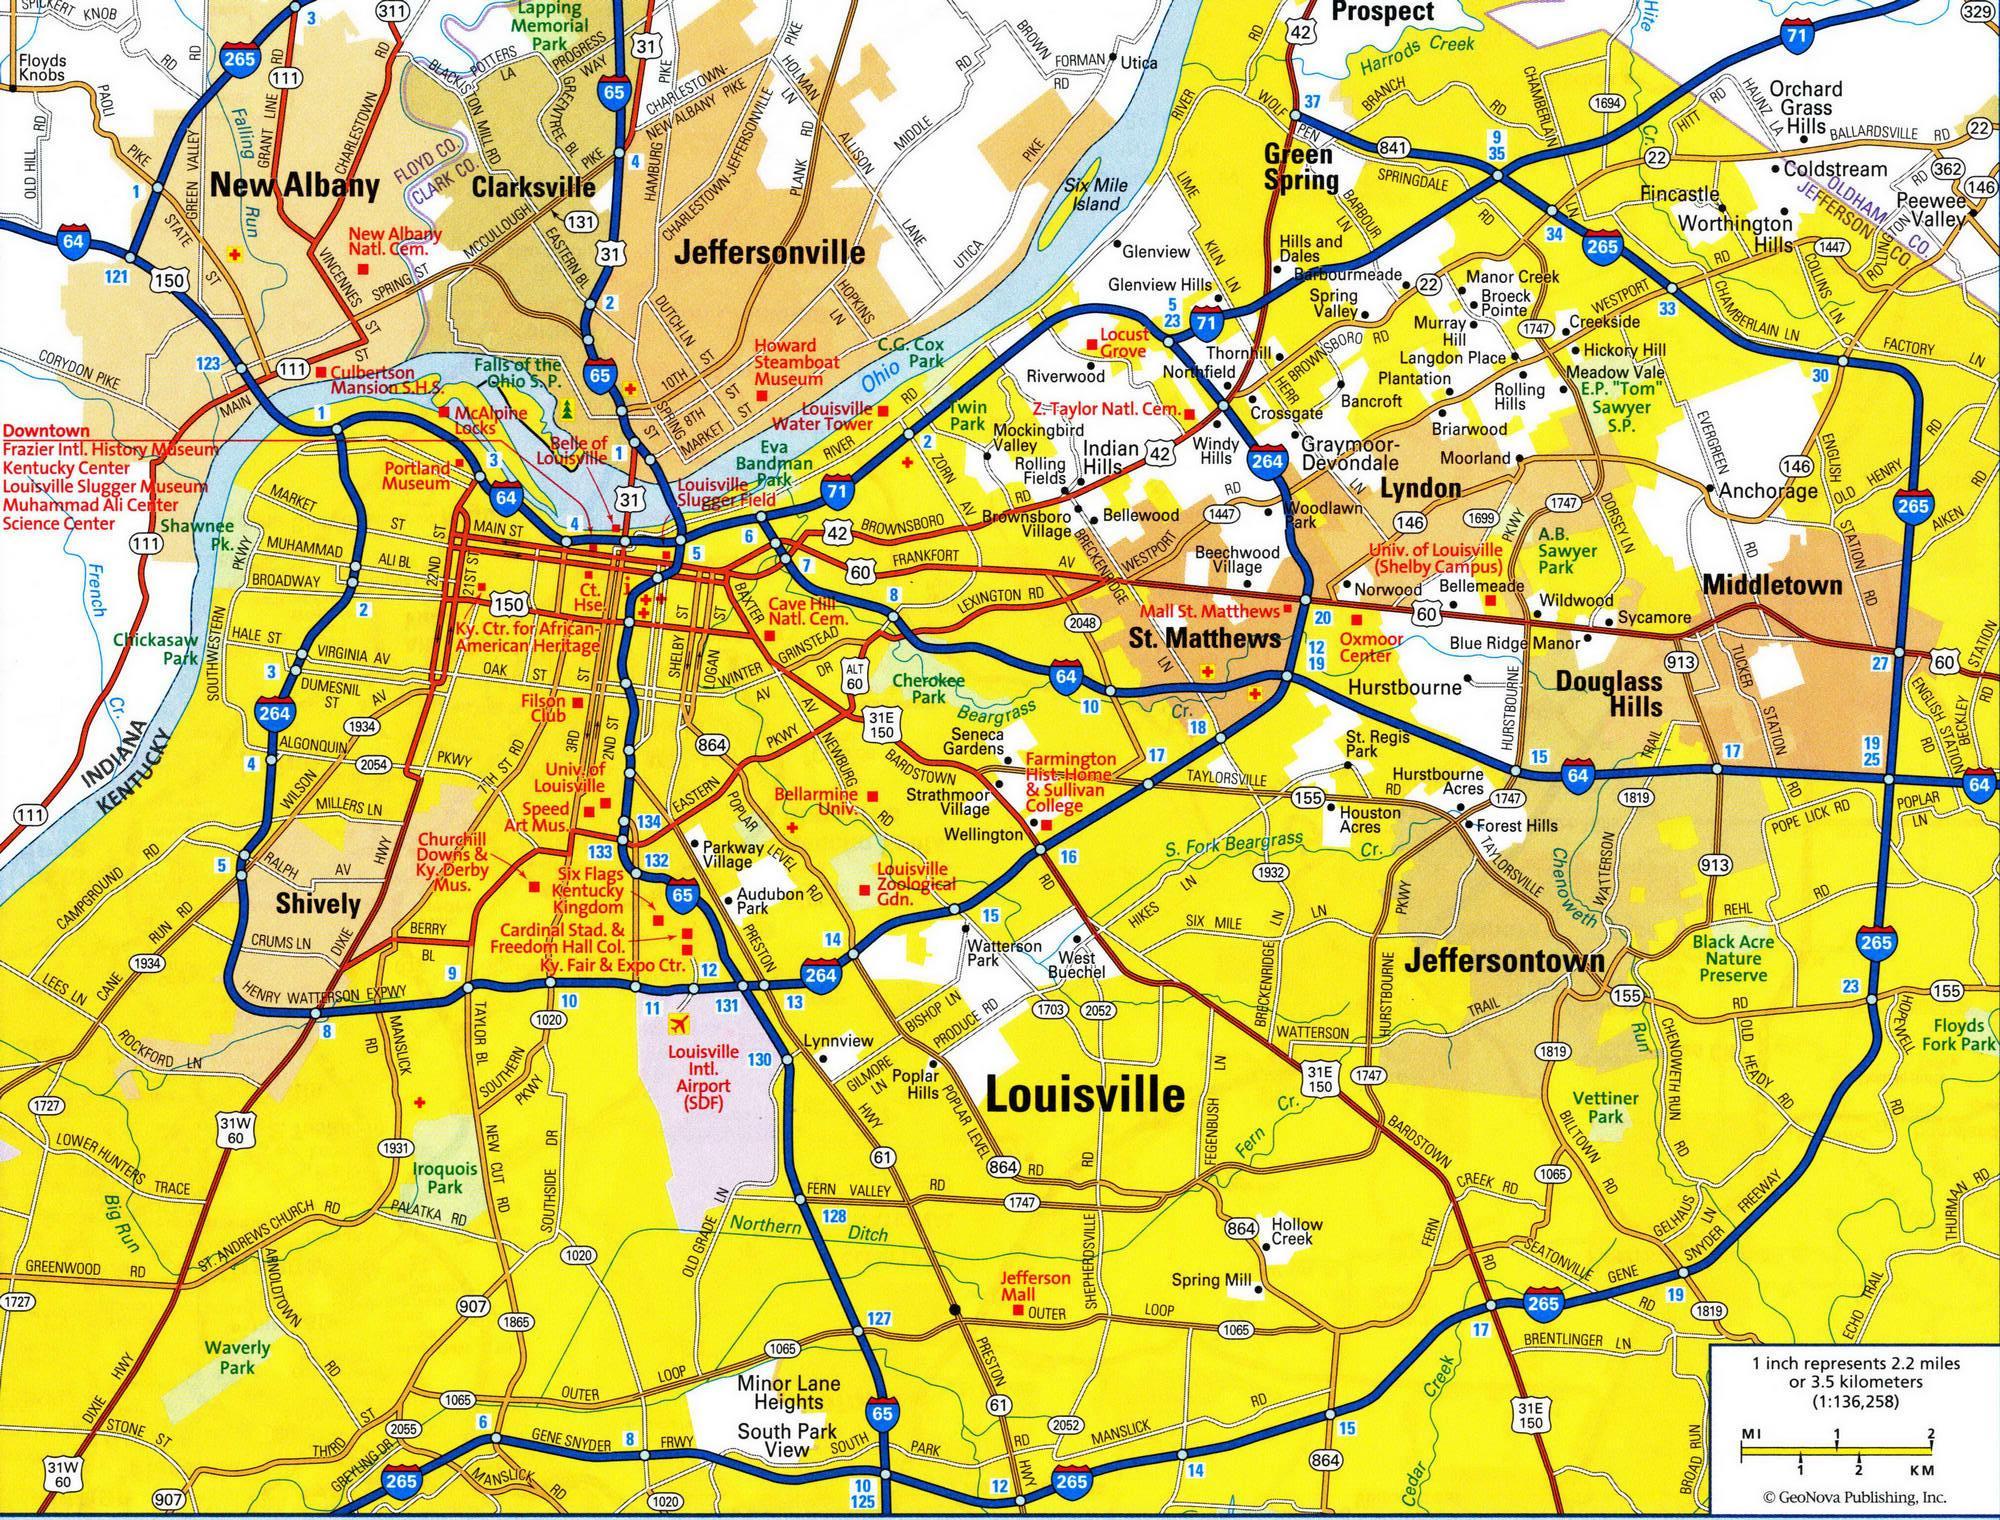 Louisville Road Map Road Map Of Louisville KY Kentucky USA